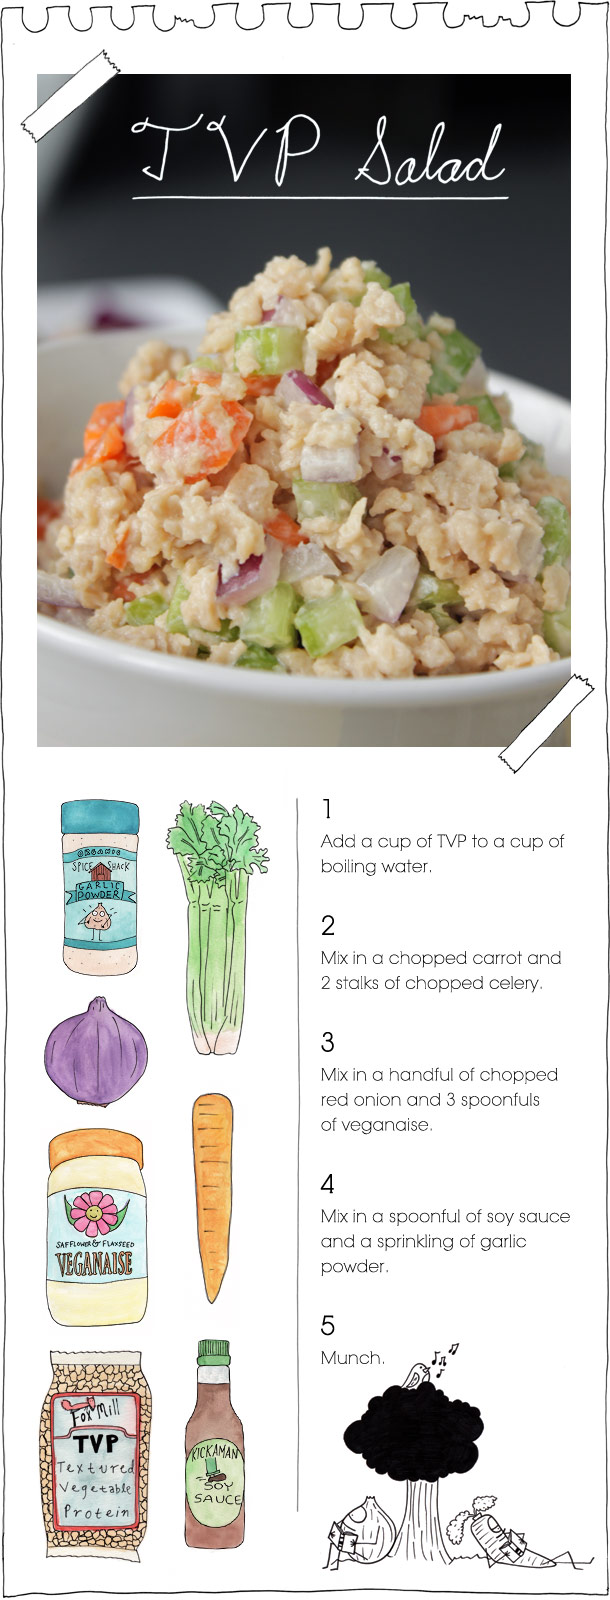 The Vegan Stoner's TVP Salad